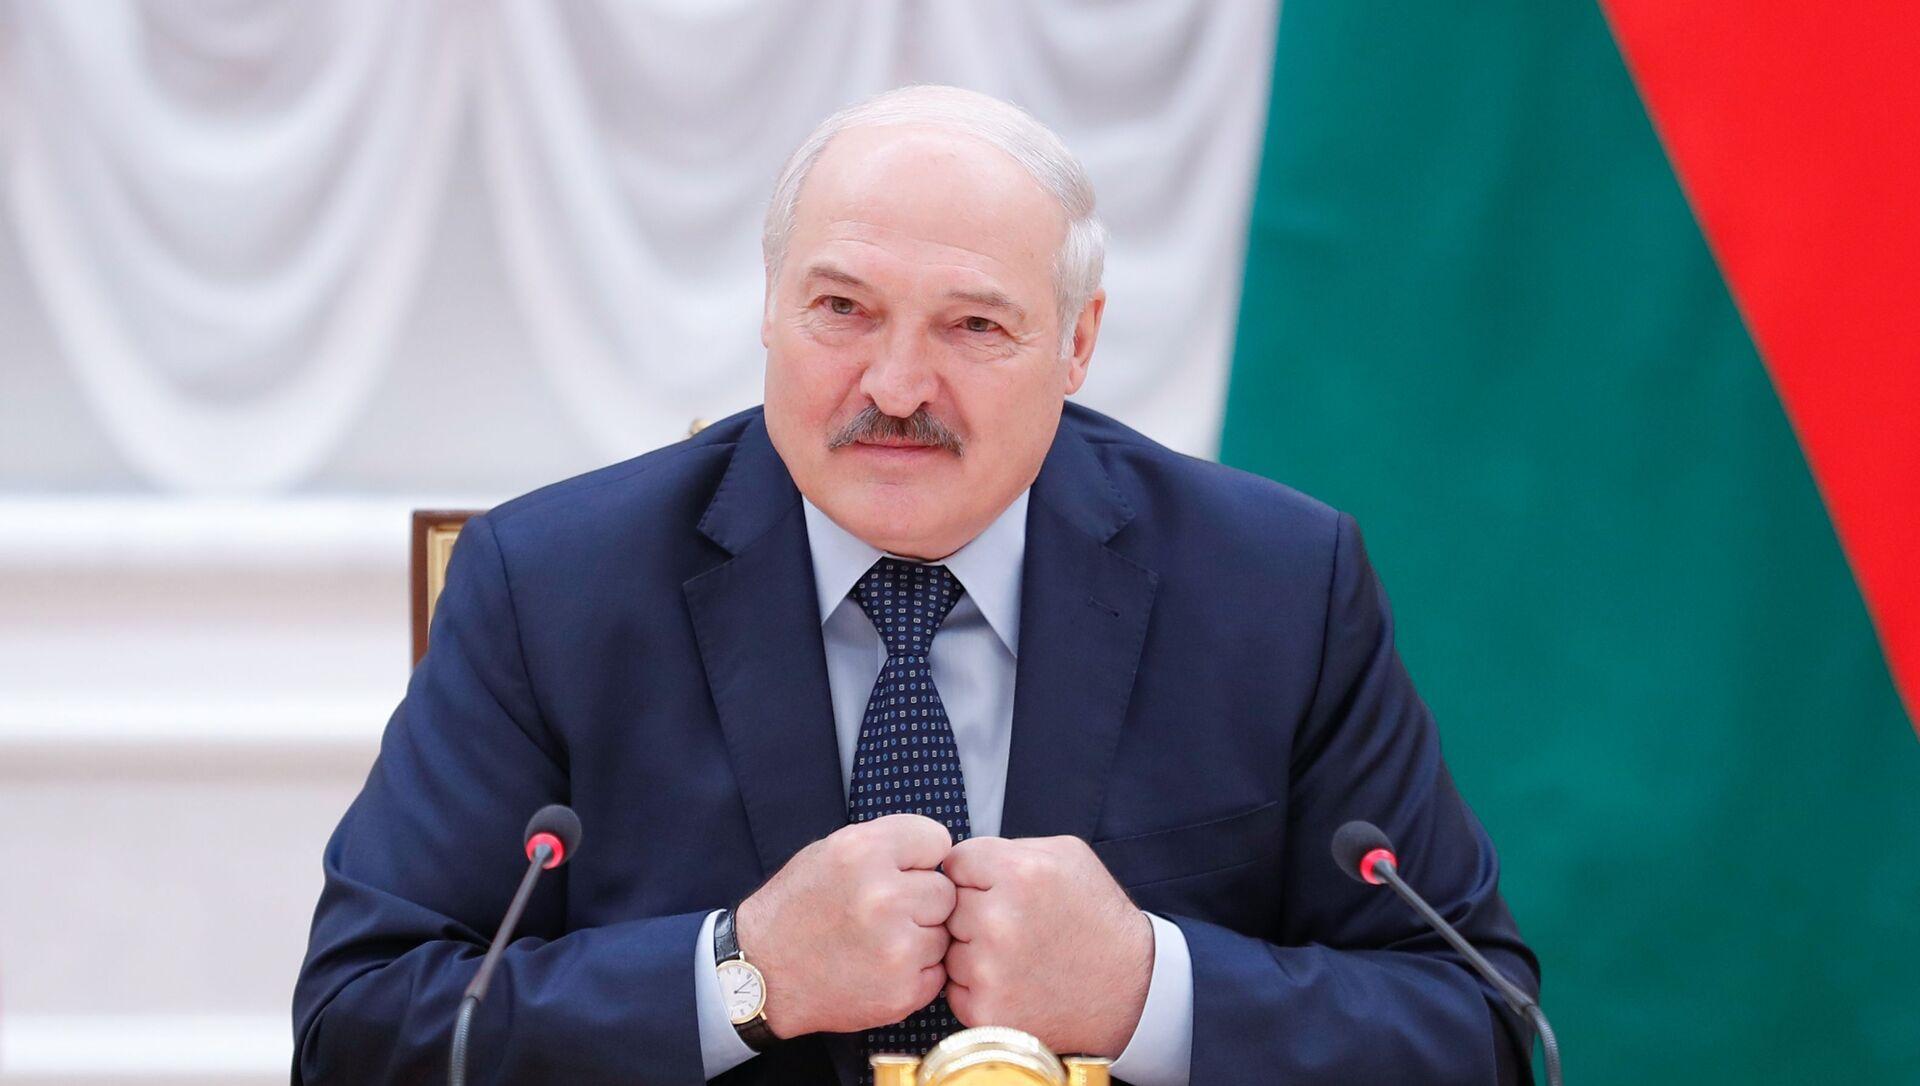 Президент Белоруссии Александр Лукашенко, фото из архива - Sputnik Азербайджан, 1920, 09.08.2021